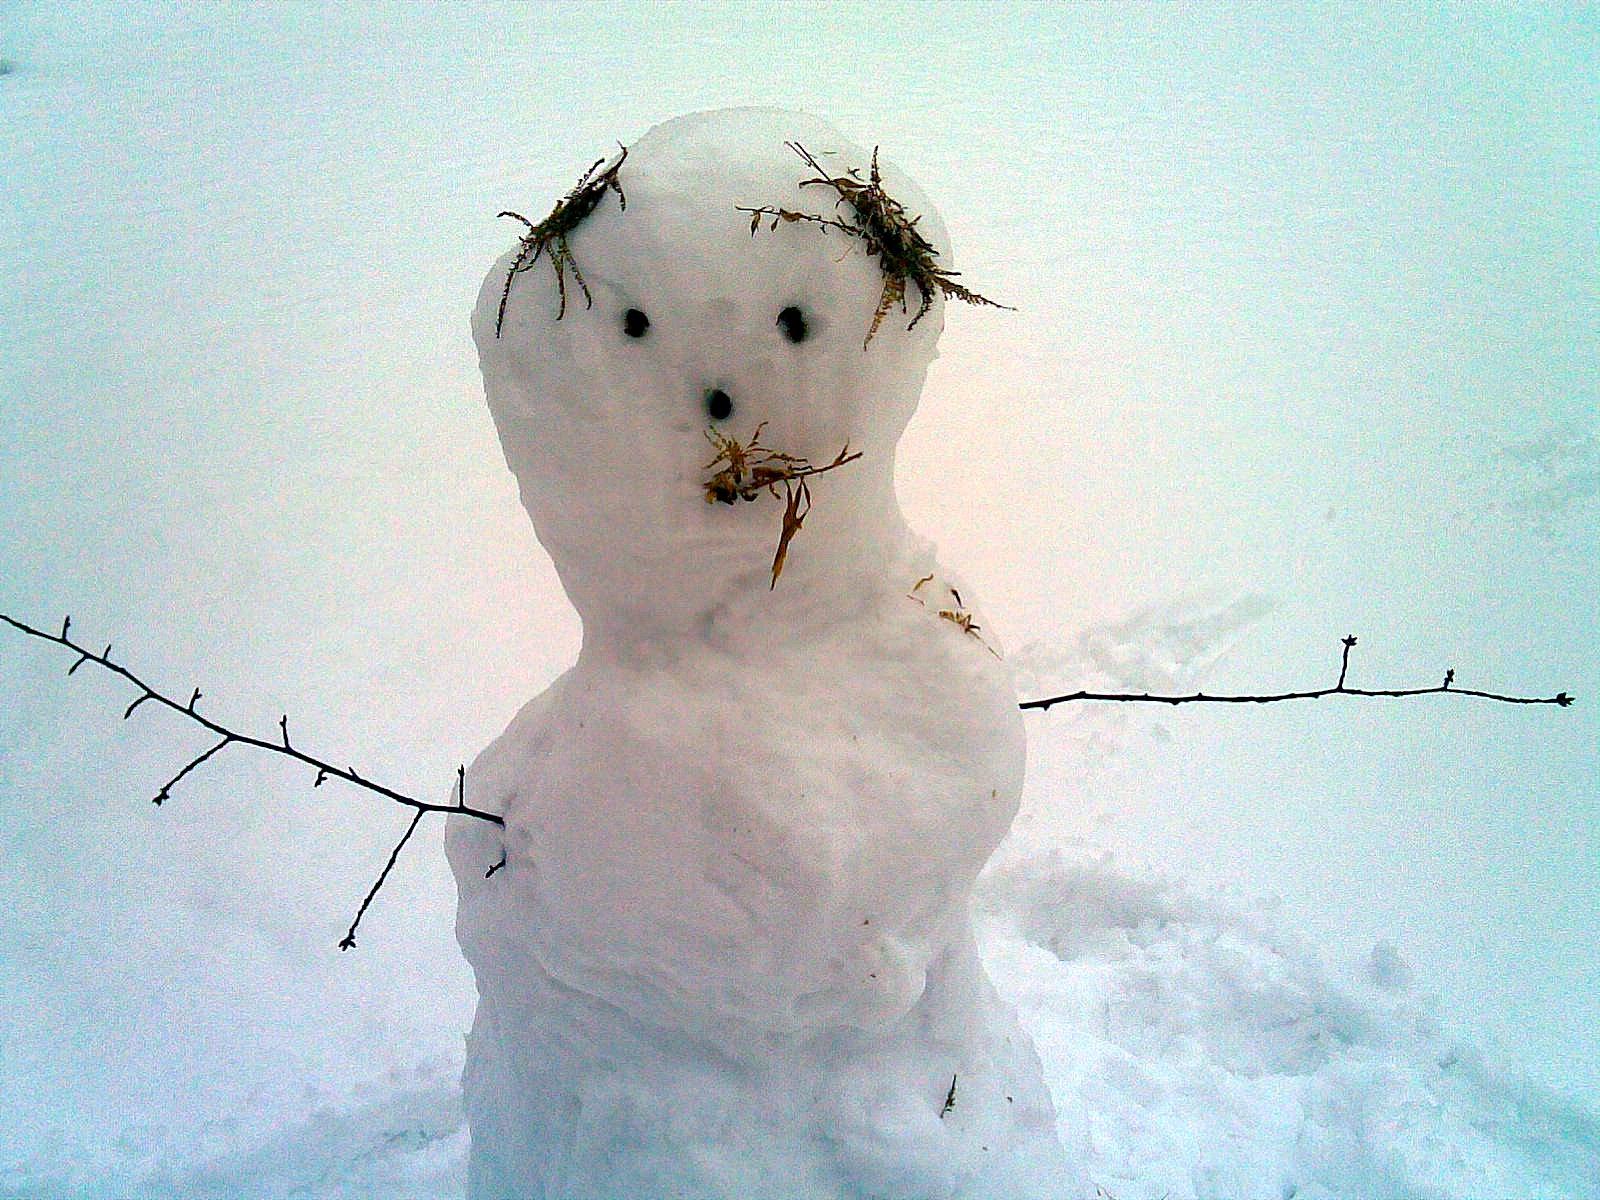 http://2.bp.blogspot.com/_KDvzKXcML4E/TSJnVFmlbtI/AAAAAAAAEGM/M38MYZaeiYU/s1600/snowman.jpg